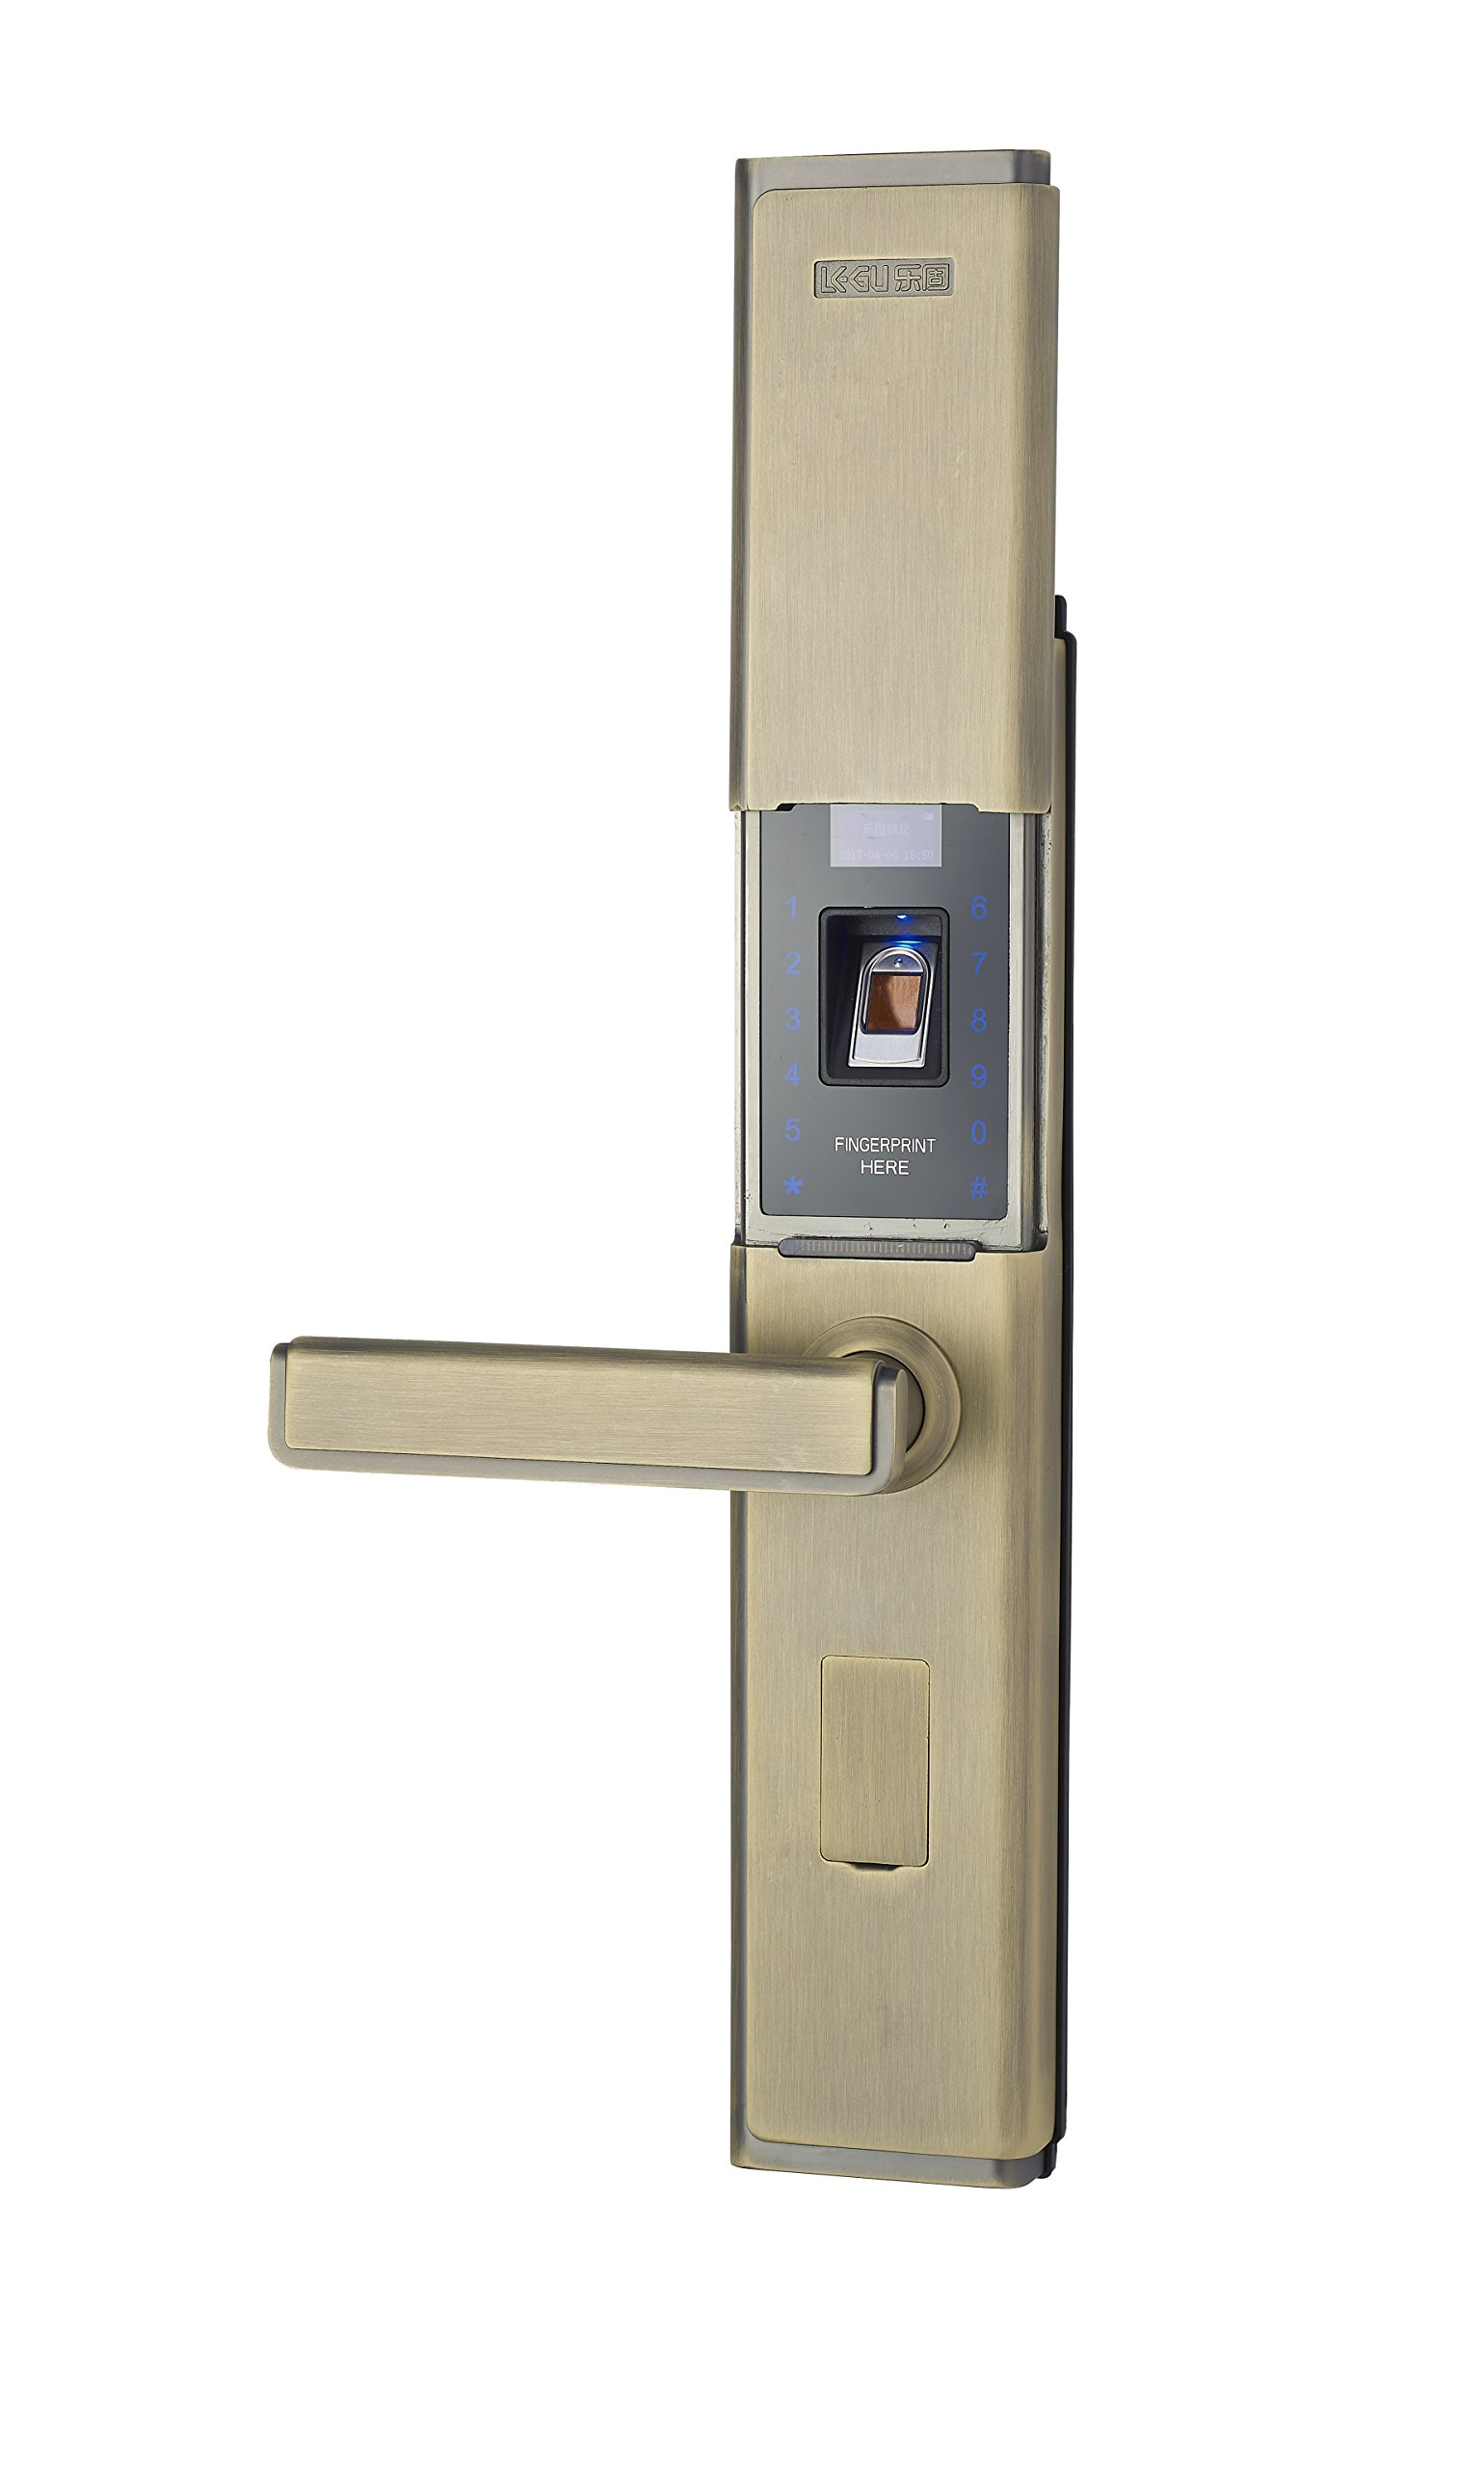 LEGU Fingerprint and Touchscreen Keyless Smart Lever Lock for Door fingerprint+password+card+key/Security intelligent anti-theft lock (Left handed)